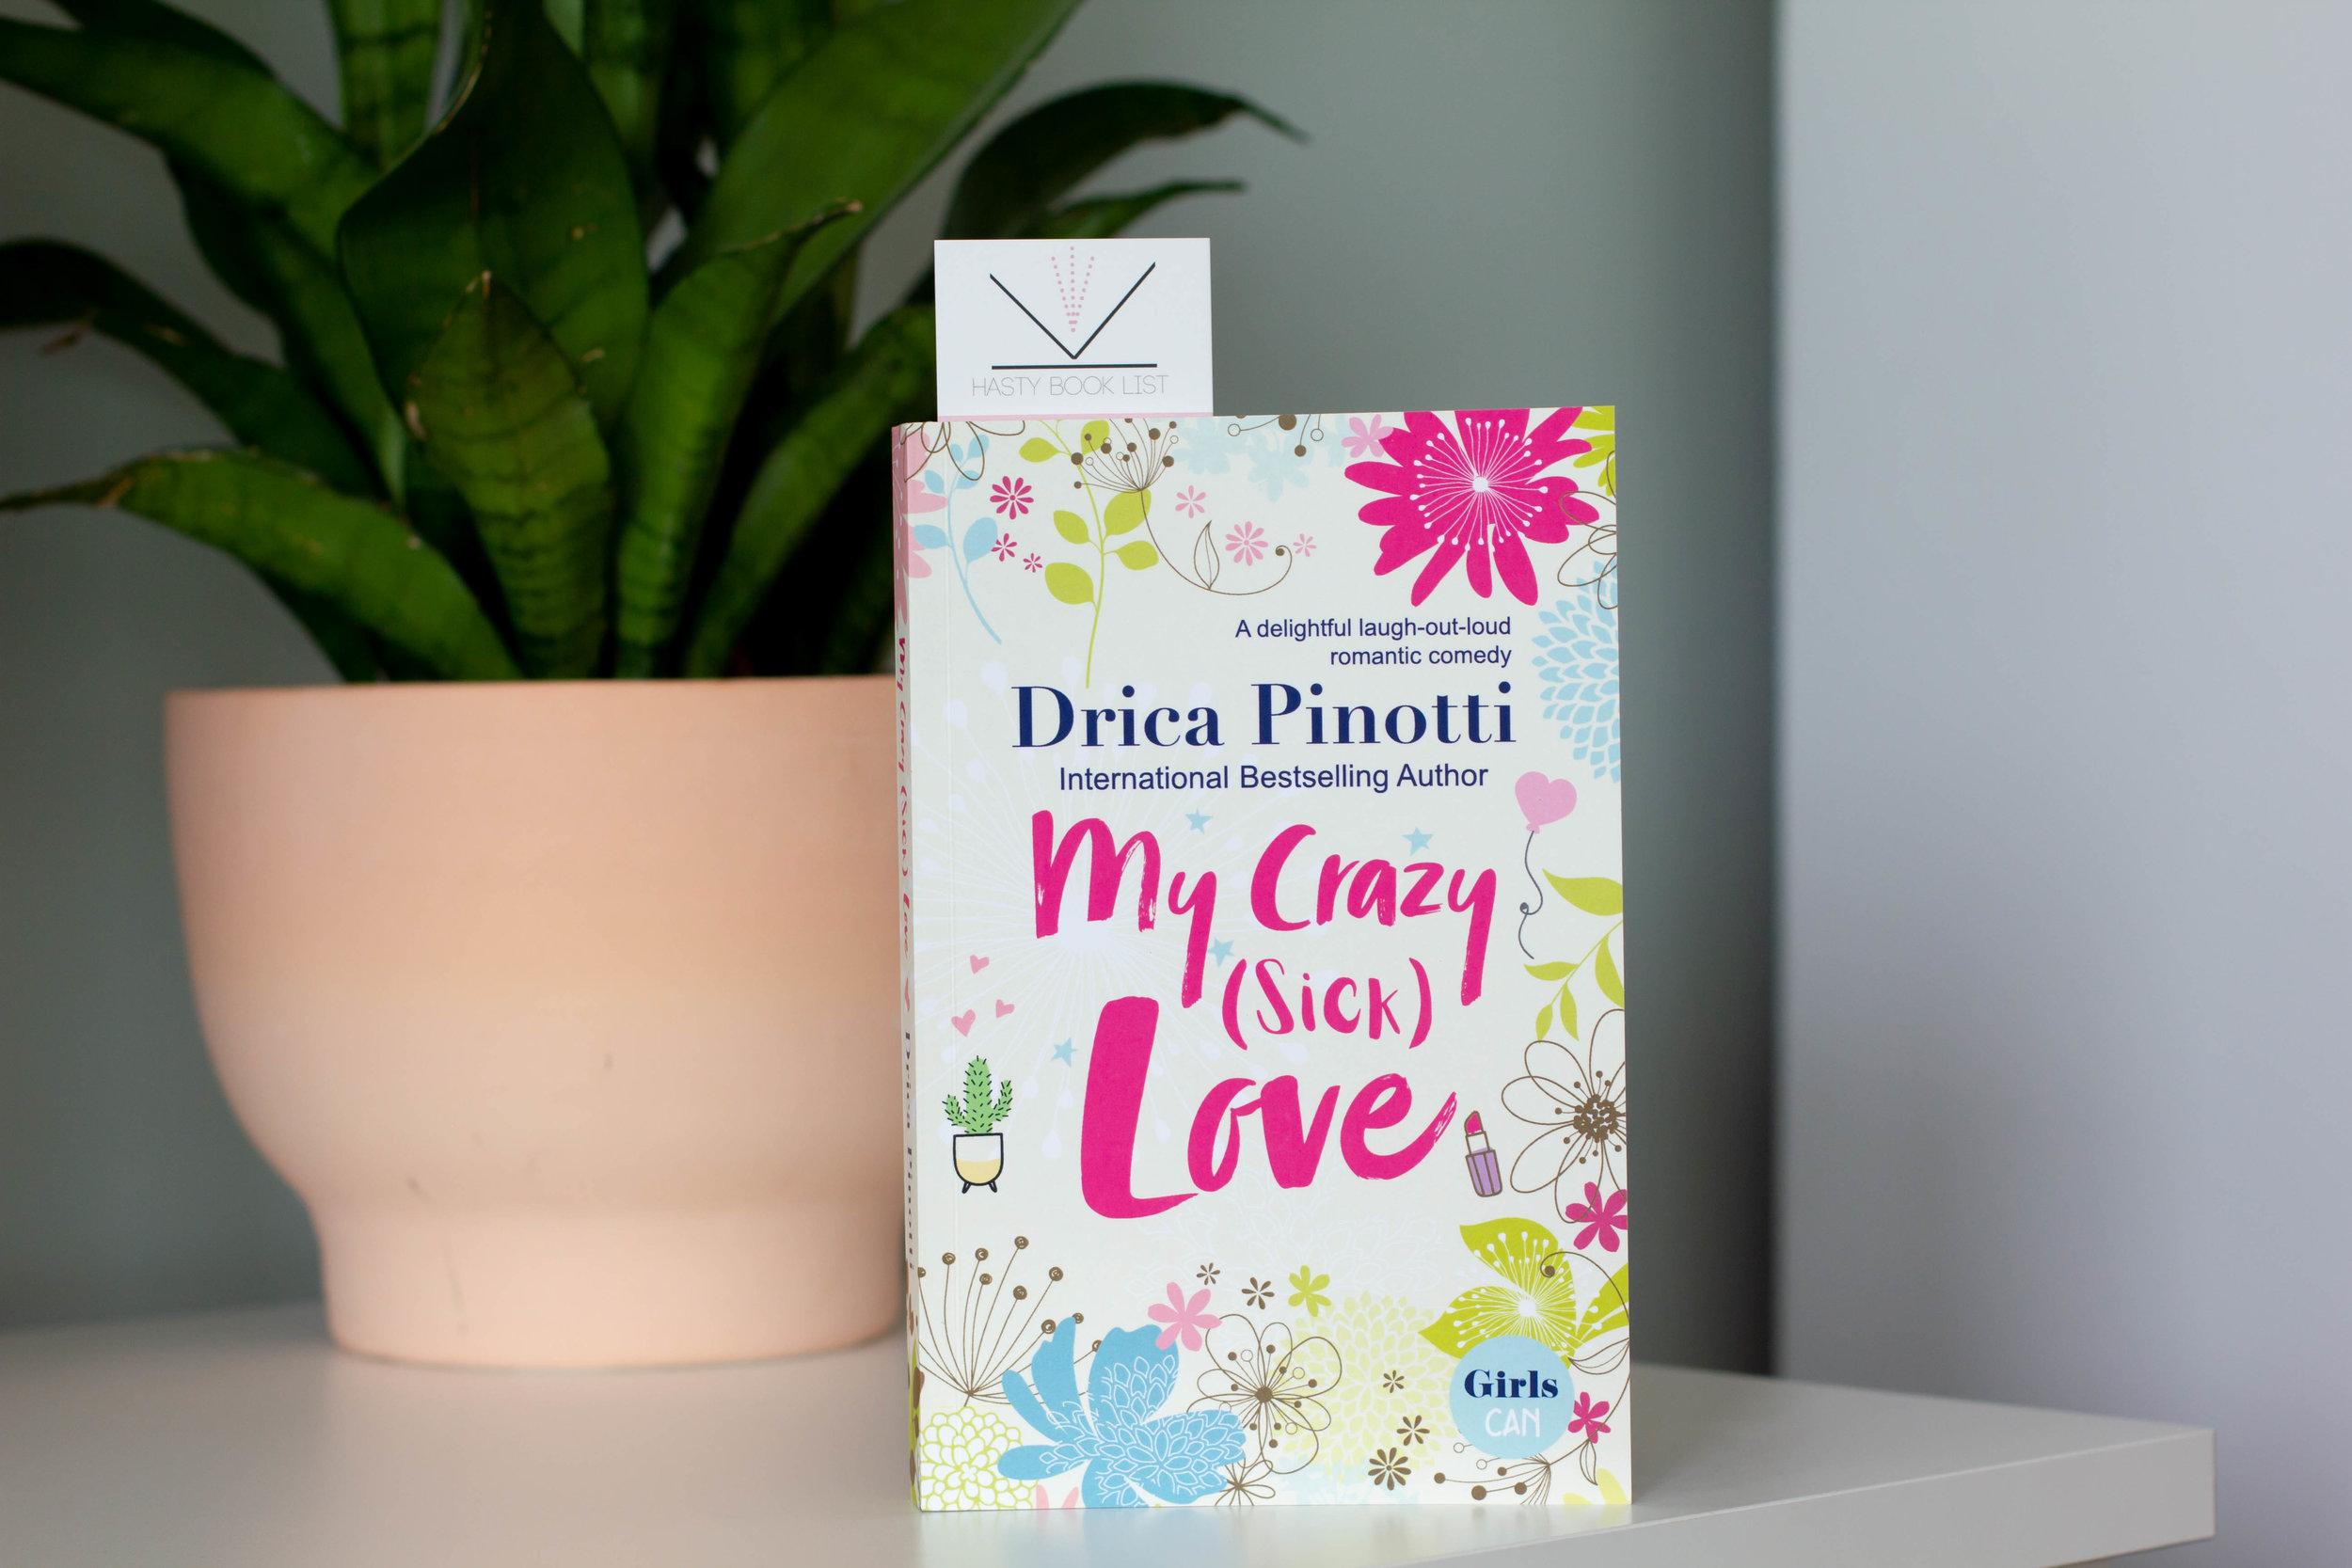 My Crazy (Sick) Love by Drica Pinotti-1.jpg